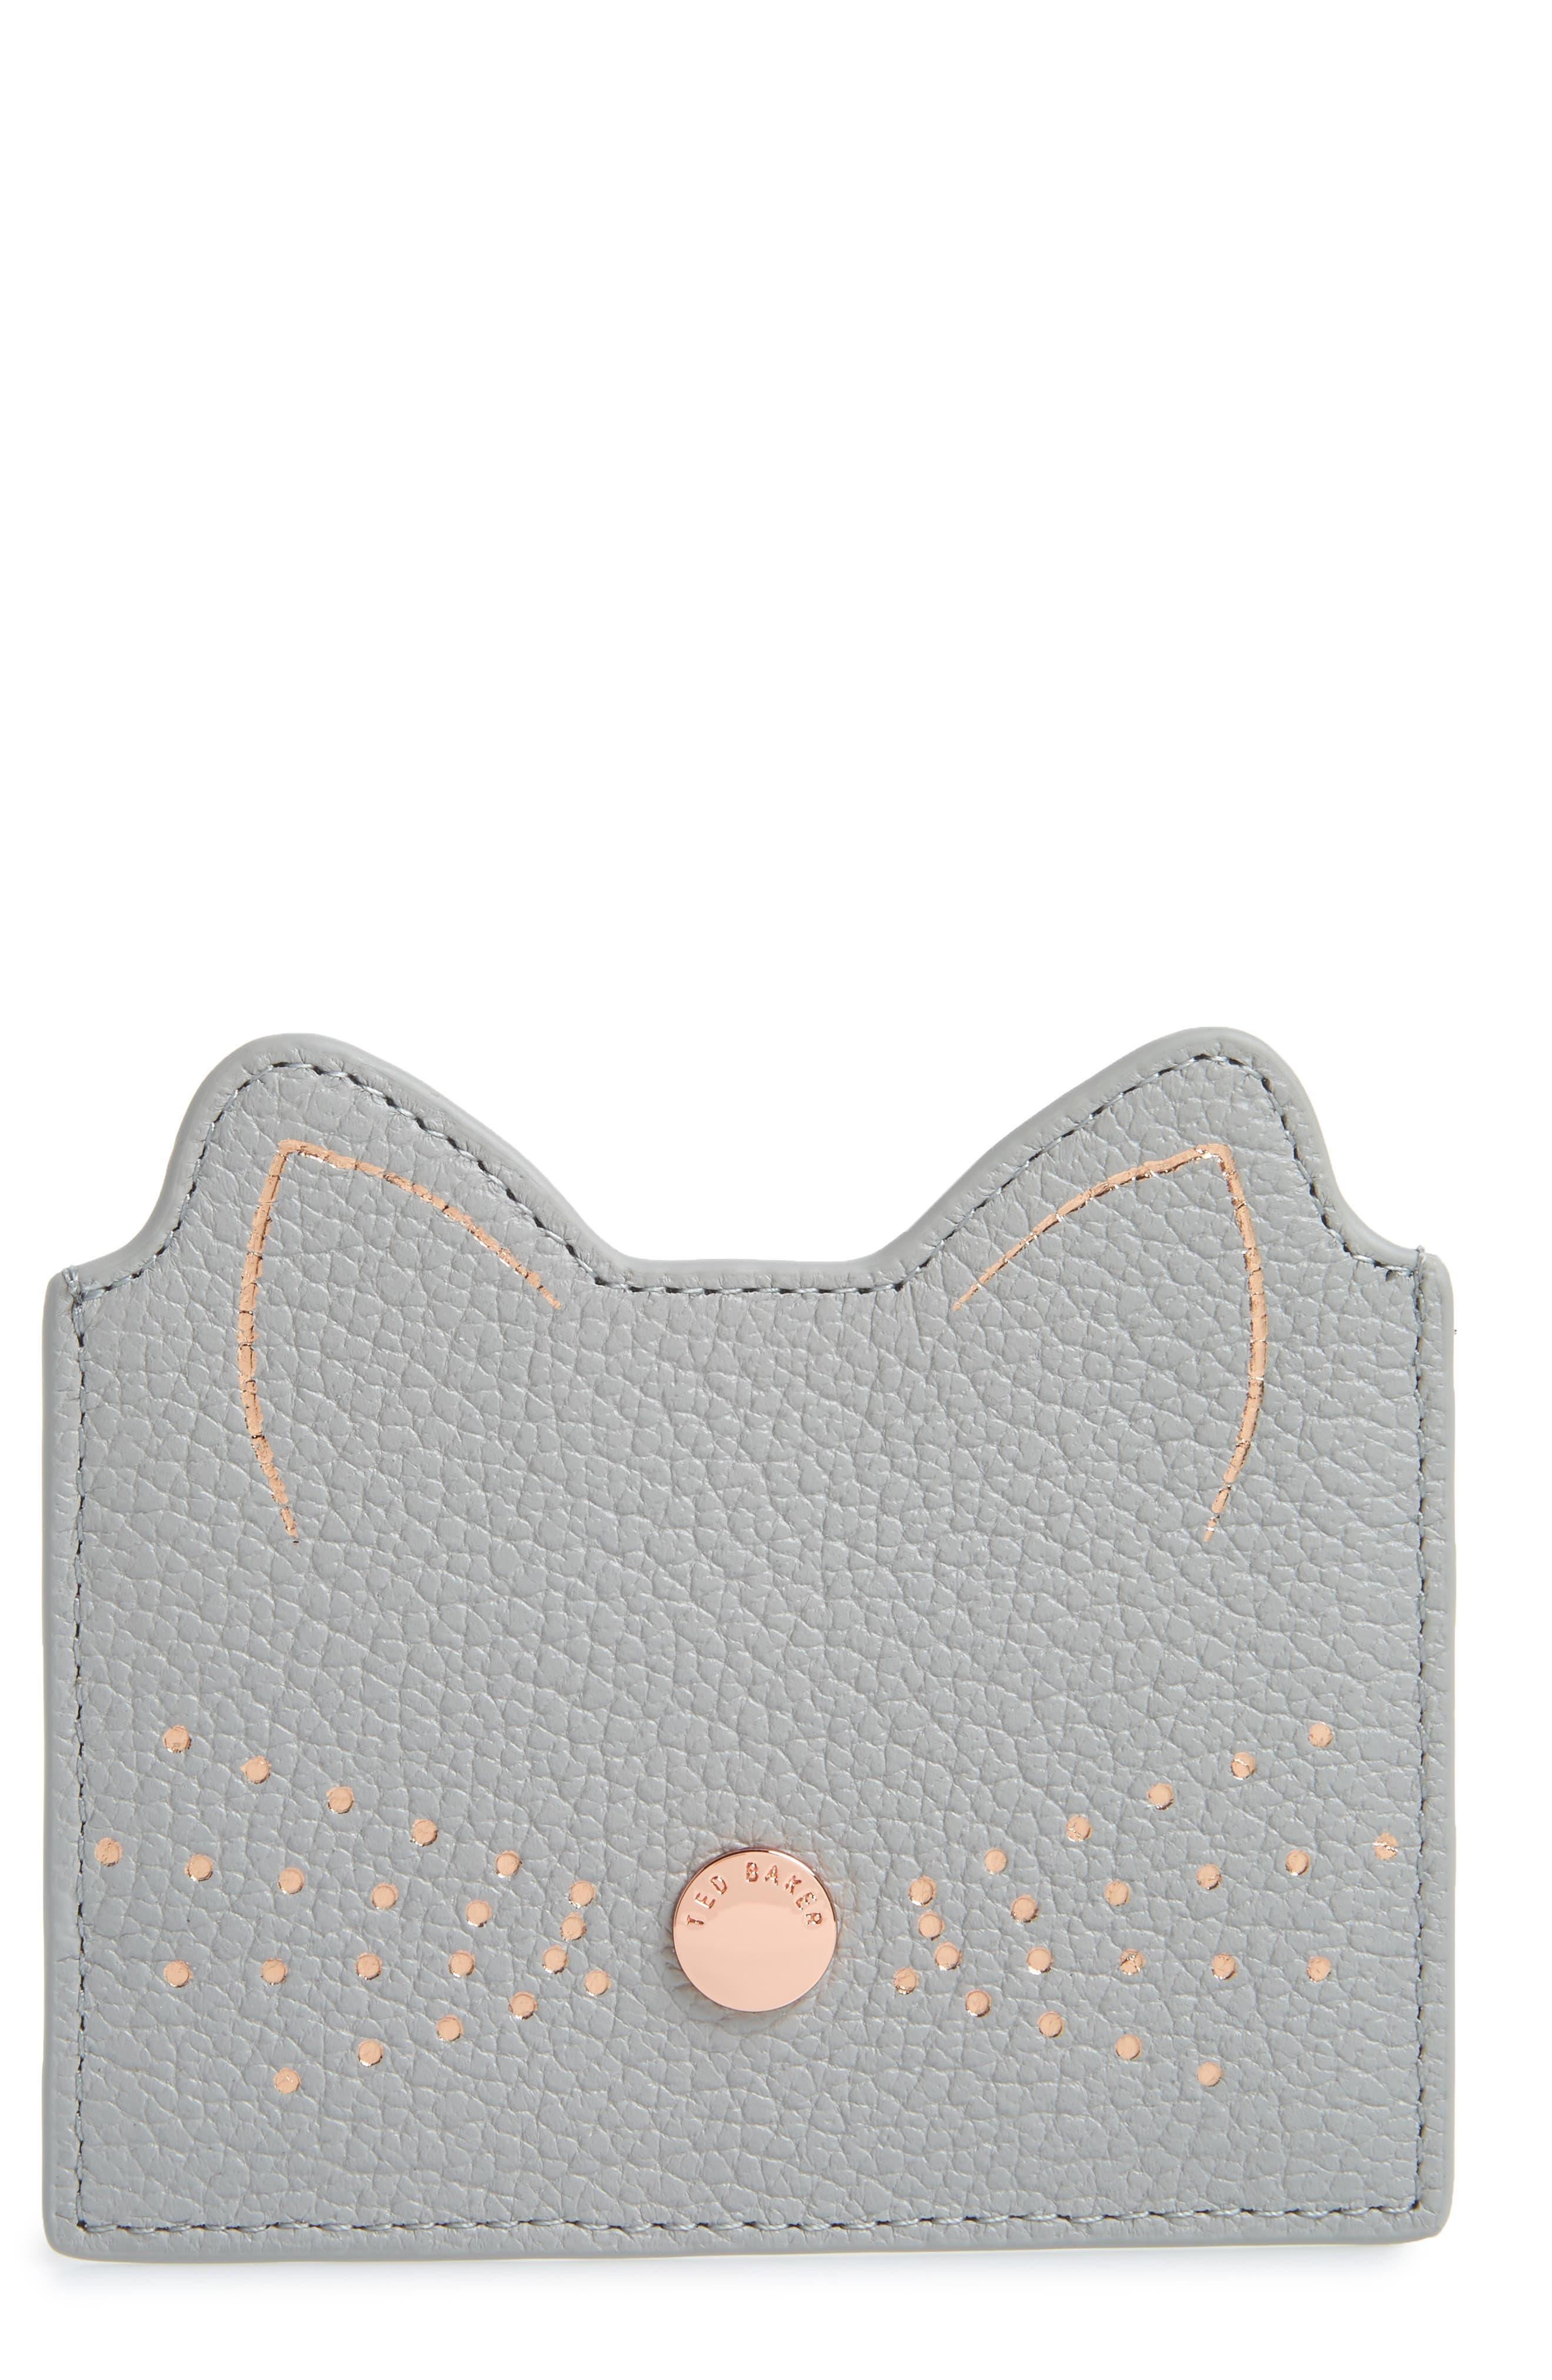 Anatoni Cat Ear Card Holder,                             Main thumbnail 1, color,                             GREY